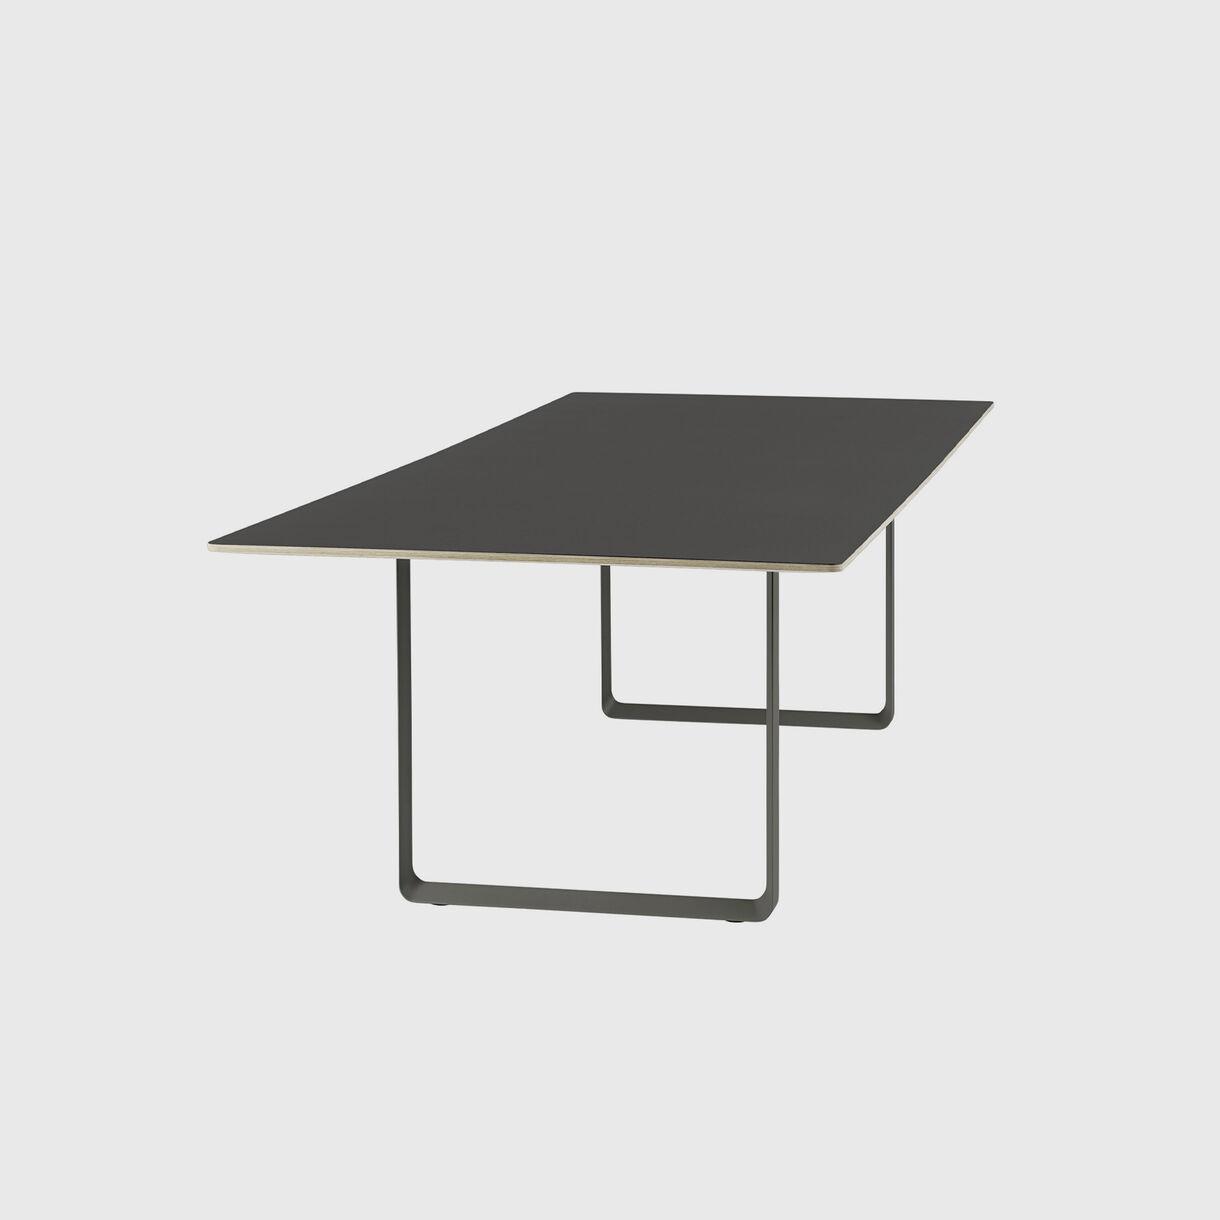 70/70 Table, 2950 x 1080, Black